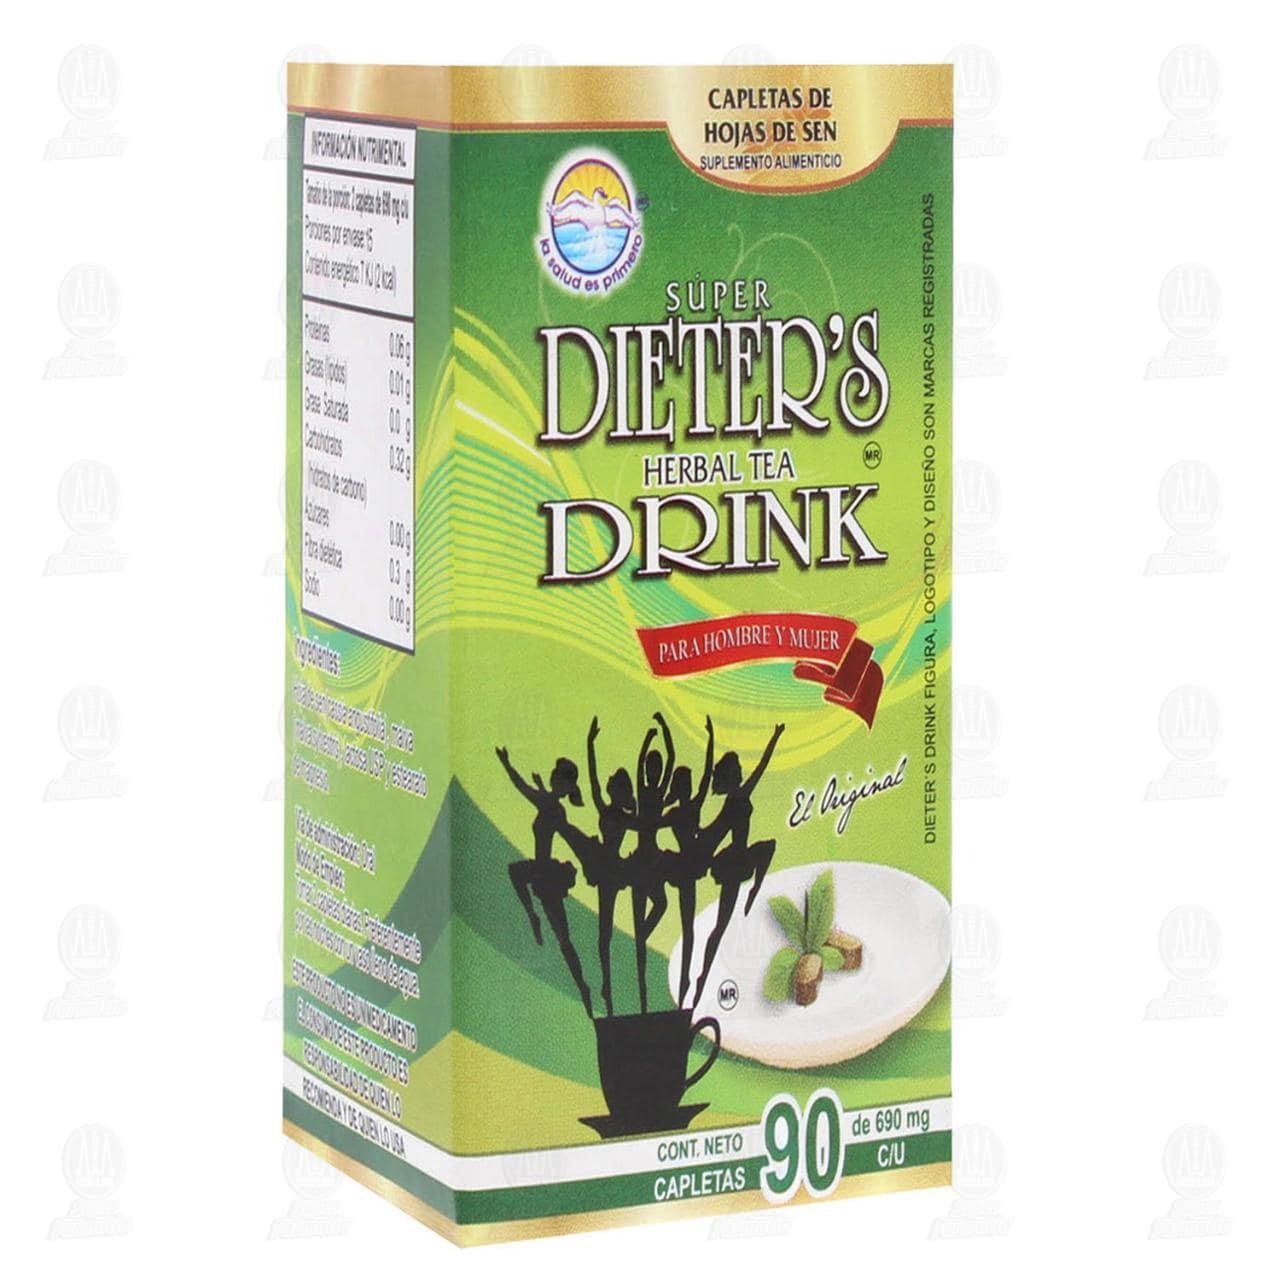 Comprar Dieter's Drink 62.1gr 90 Capletas en Farmacias Guadalajara